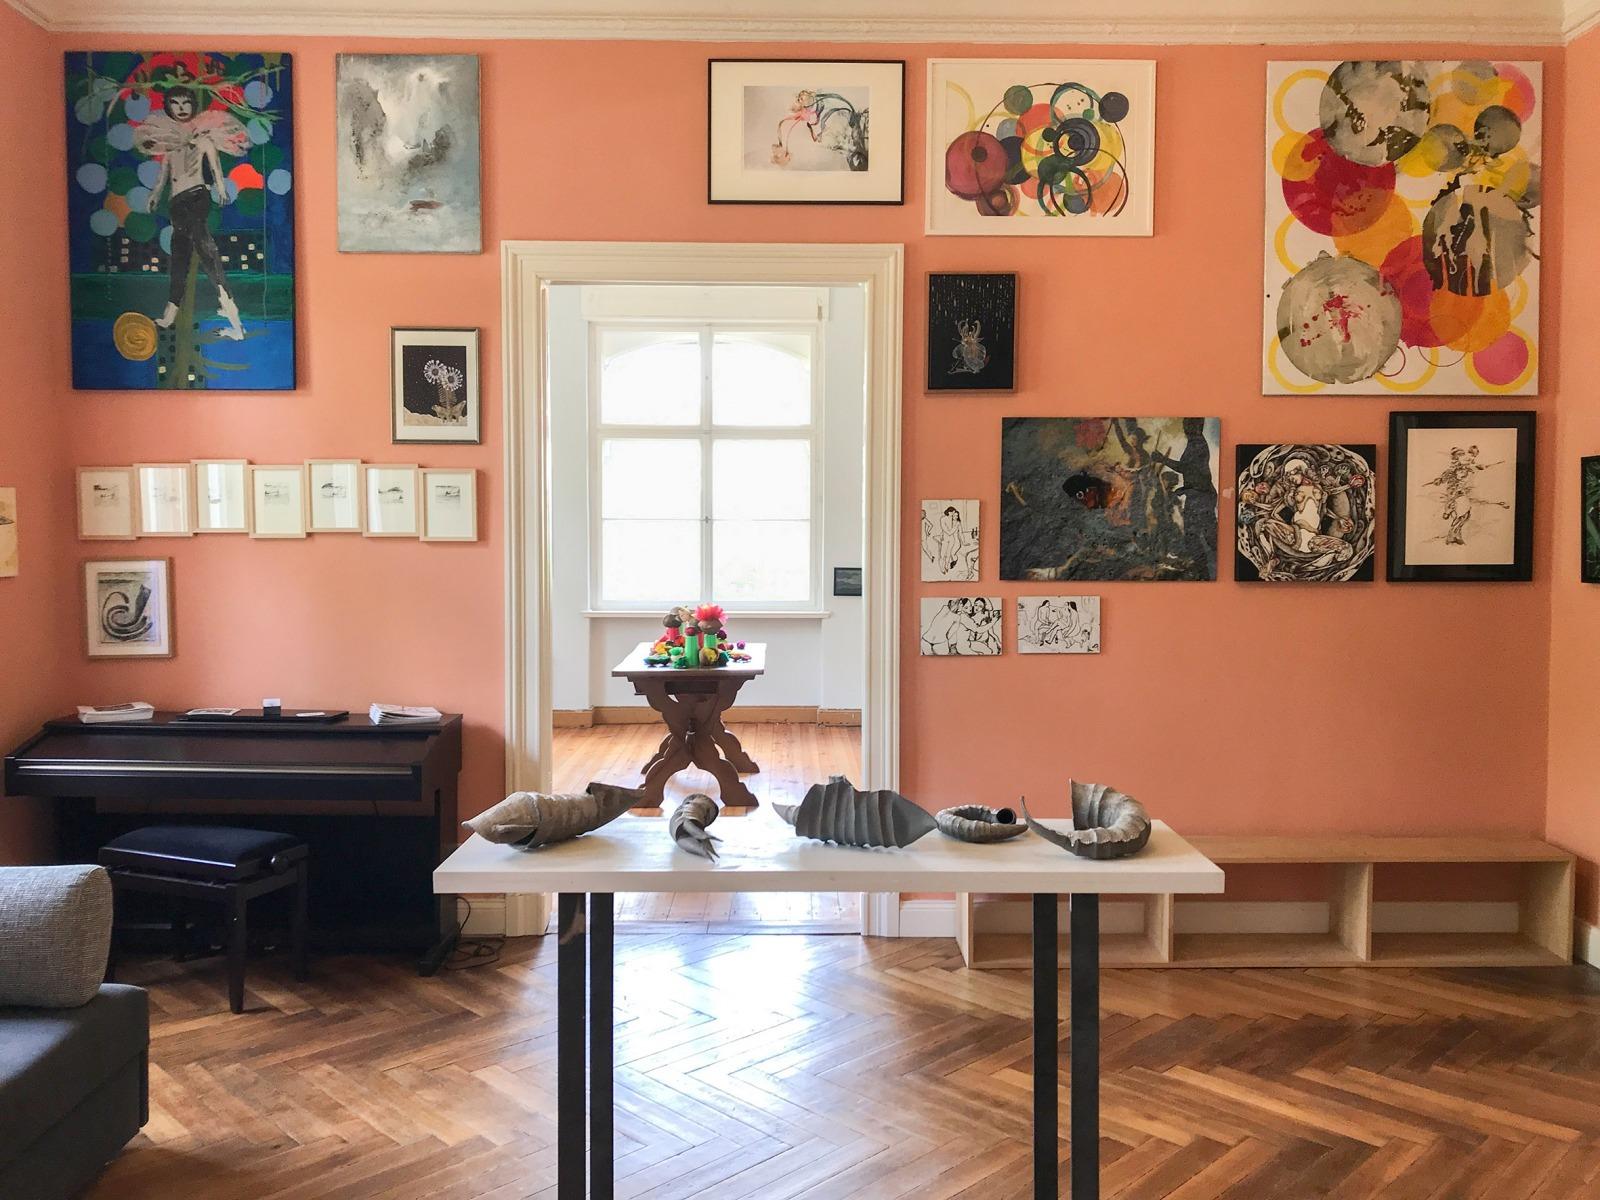 KunstkkA in der Villa Blunk in Wriezen